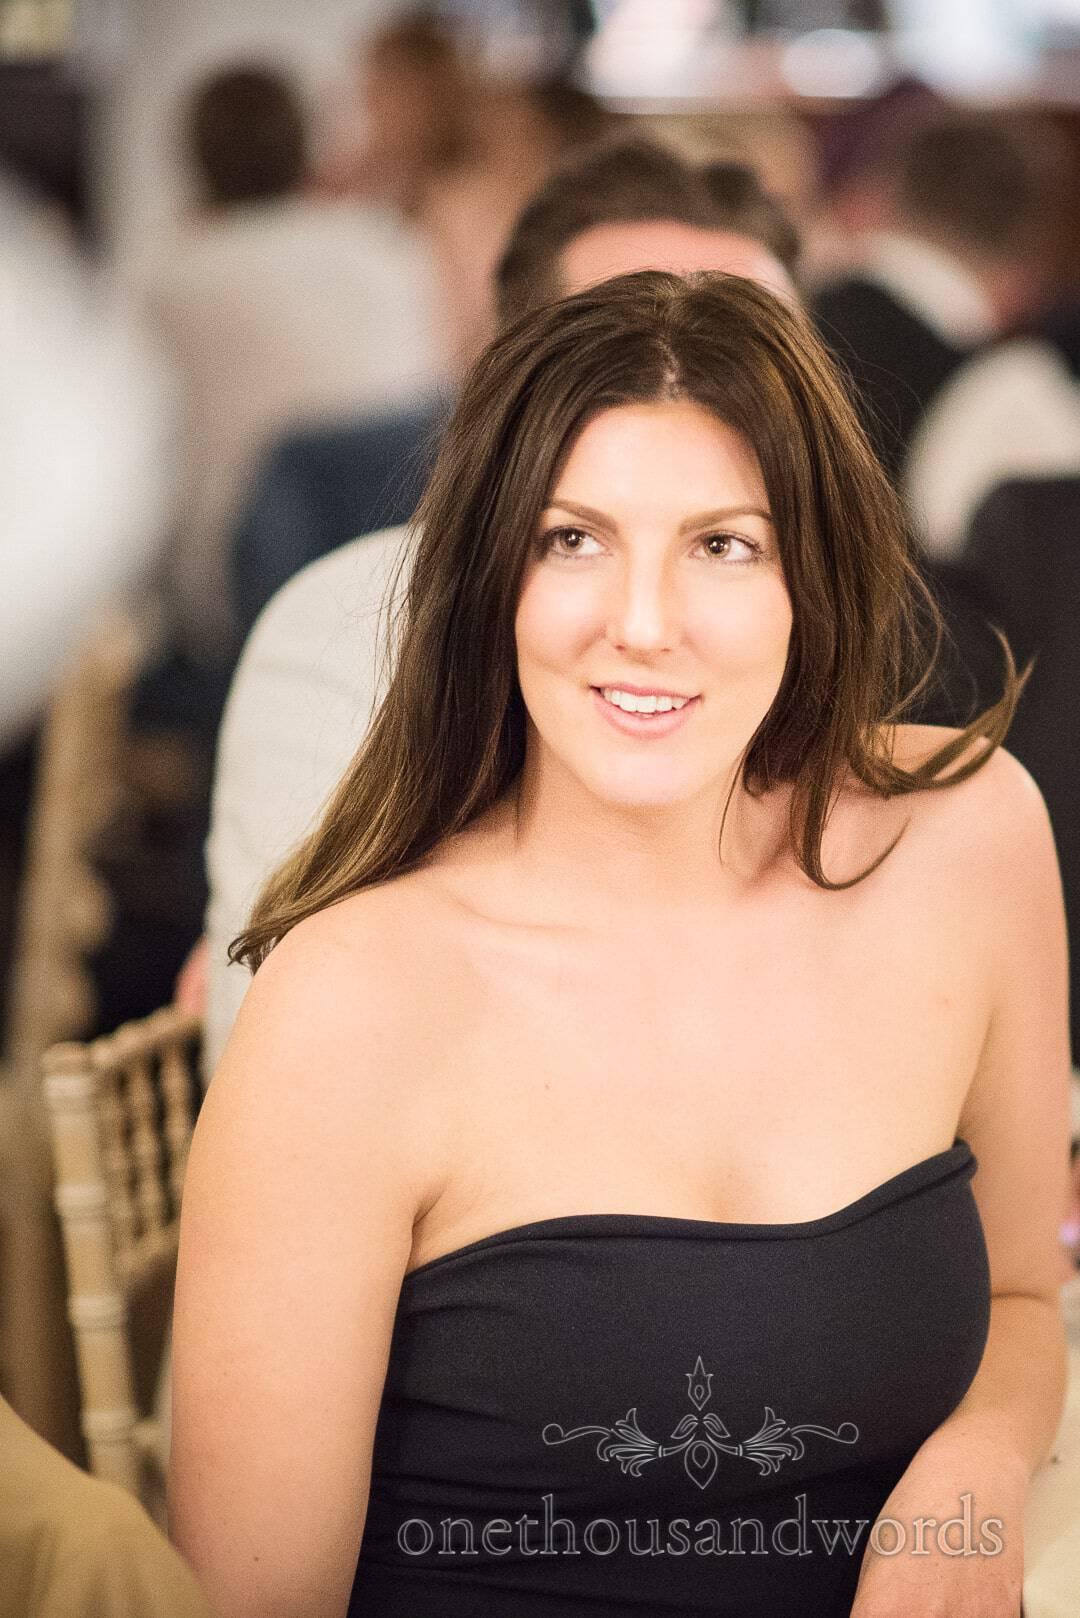 Beautiful brunette wedding guest portrait photograph at The Italian Villa Wedding